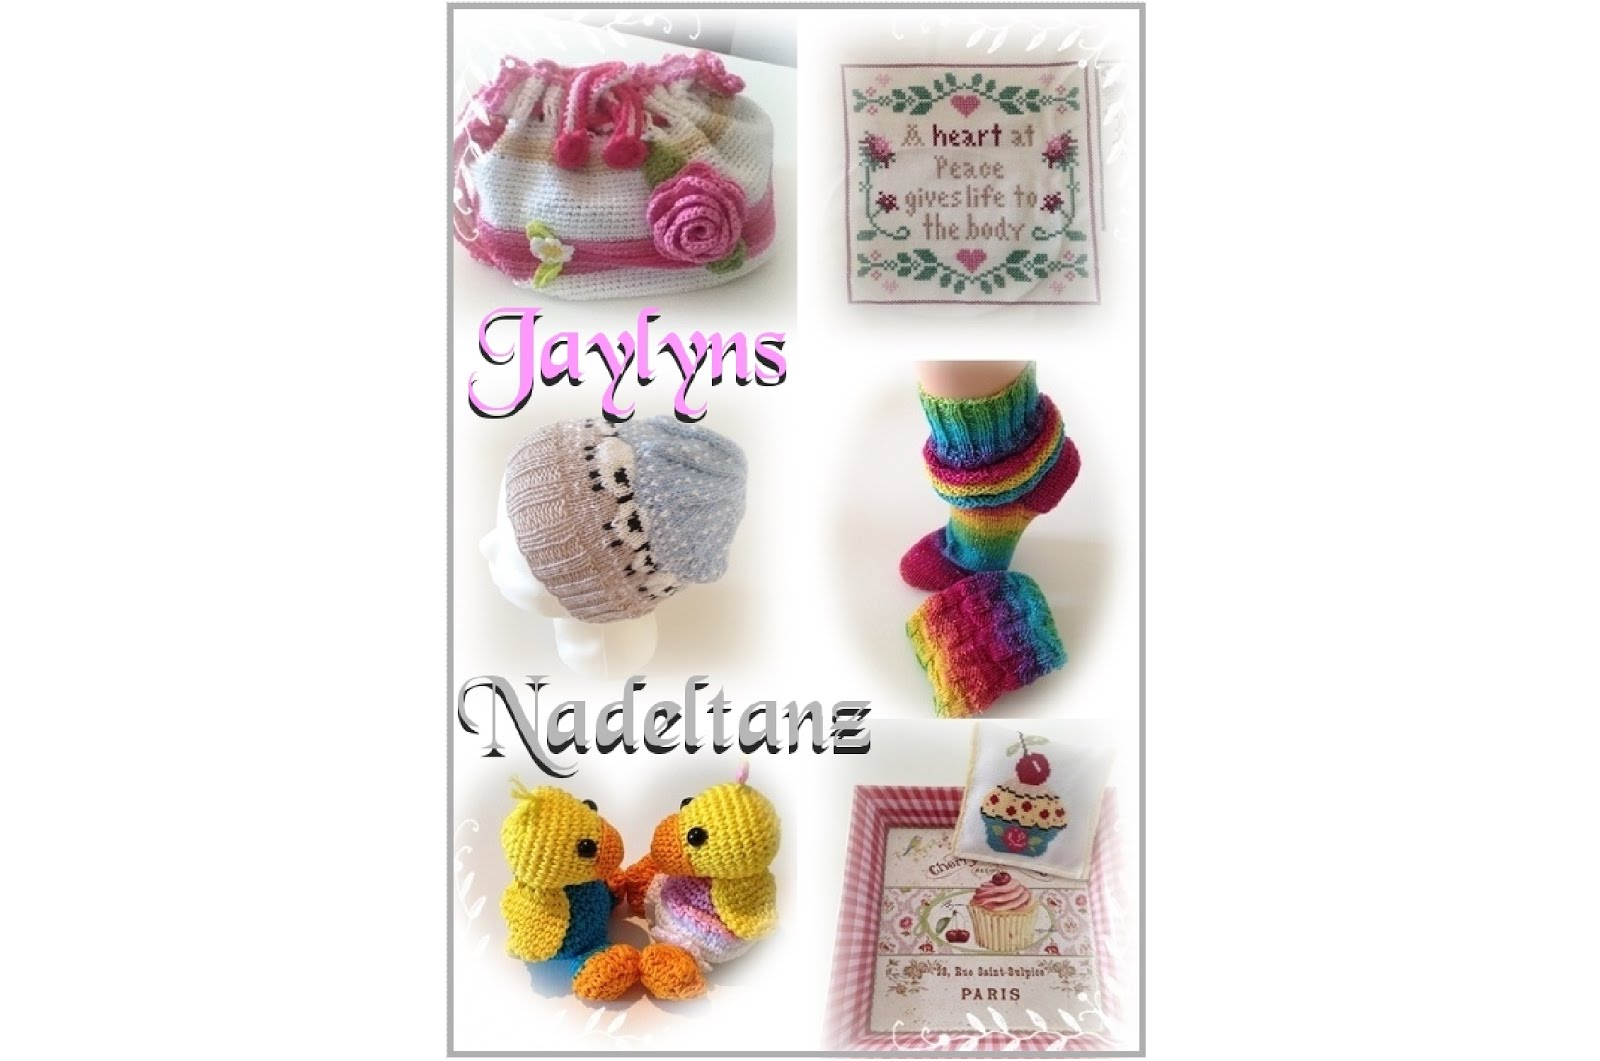 Jaylyns Nadeltanz